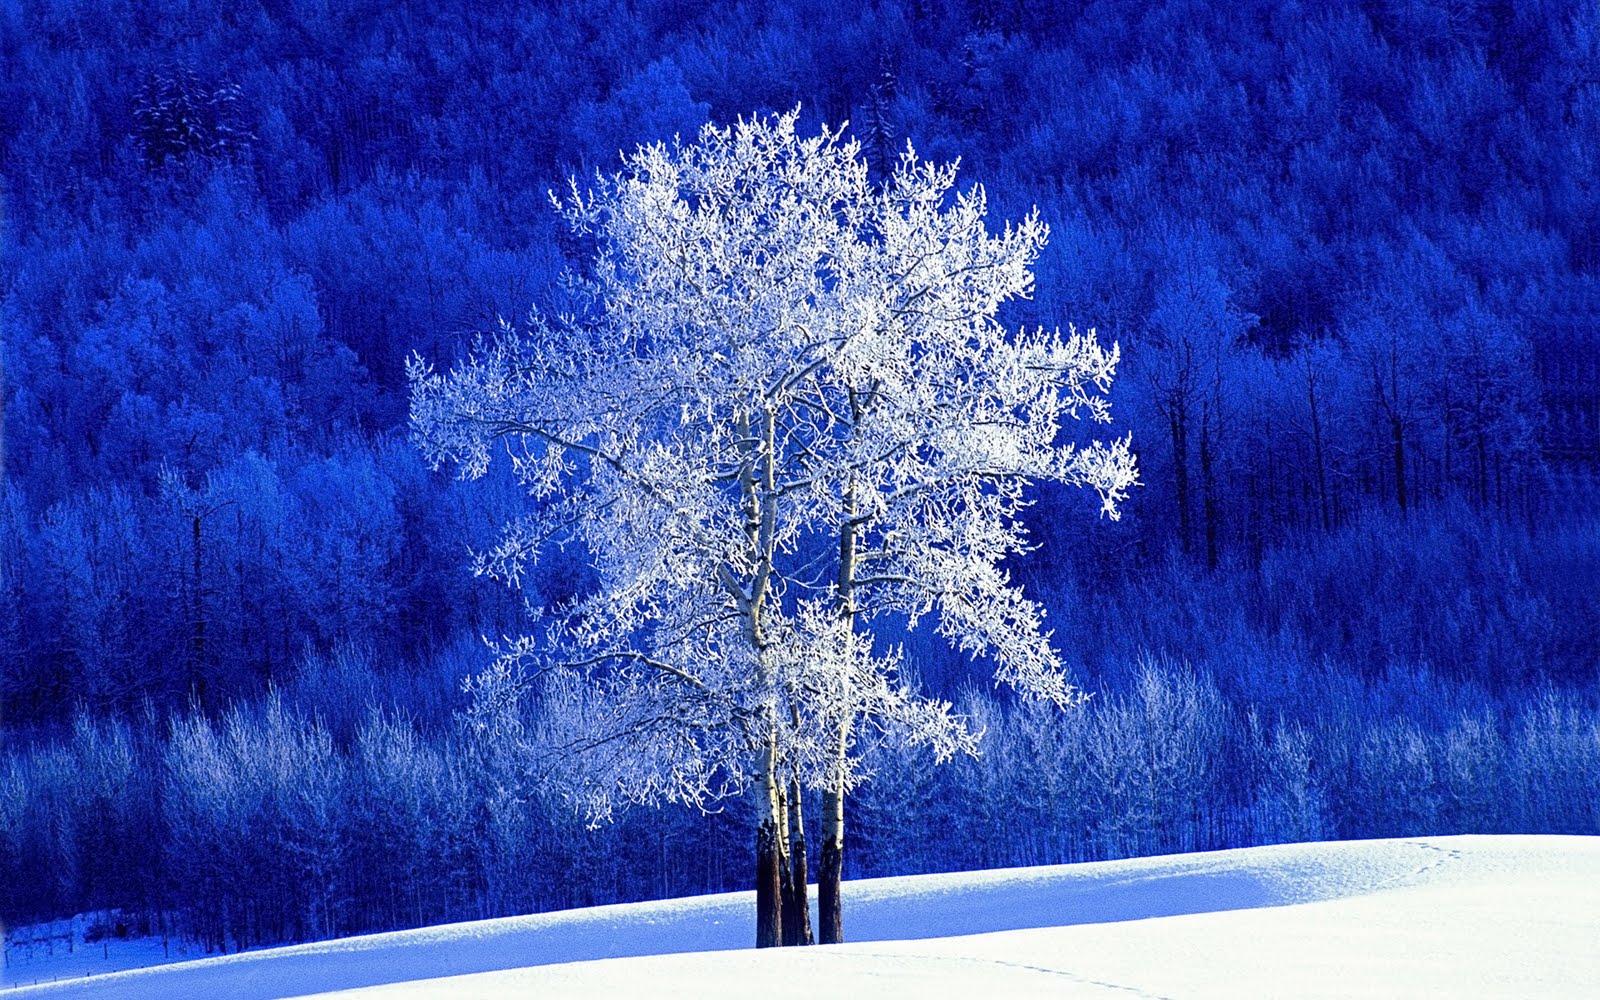 http://3.bp.blogspot.com/_W1ueYt1O3xs/TQqD-yiahyI/AAAAAAAAXbg/OOiNkYvDpDI/d/Winter+Landscape+Wallpapers+%25288%2529.jpg